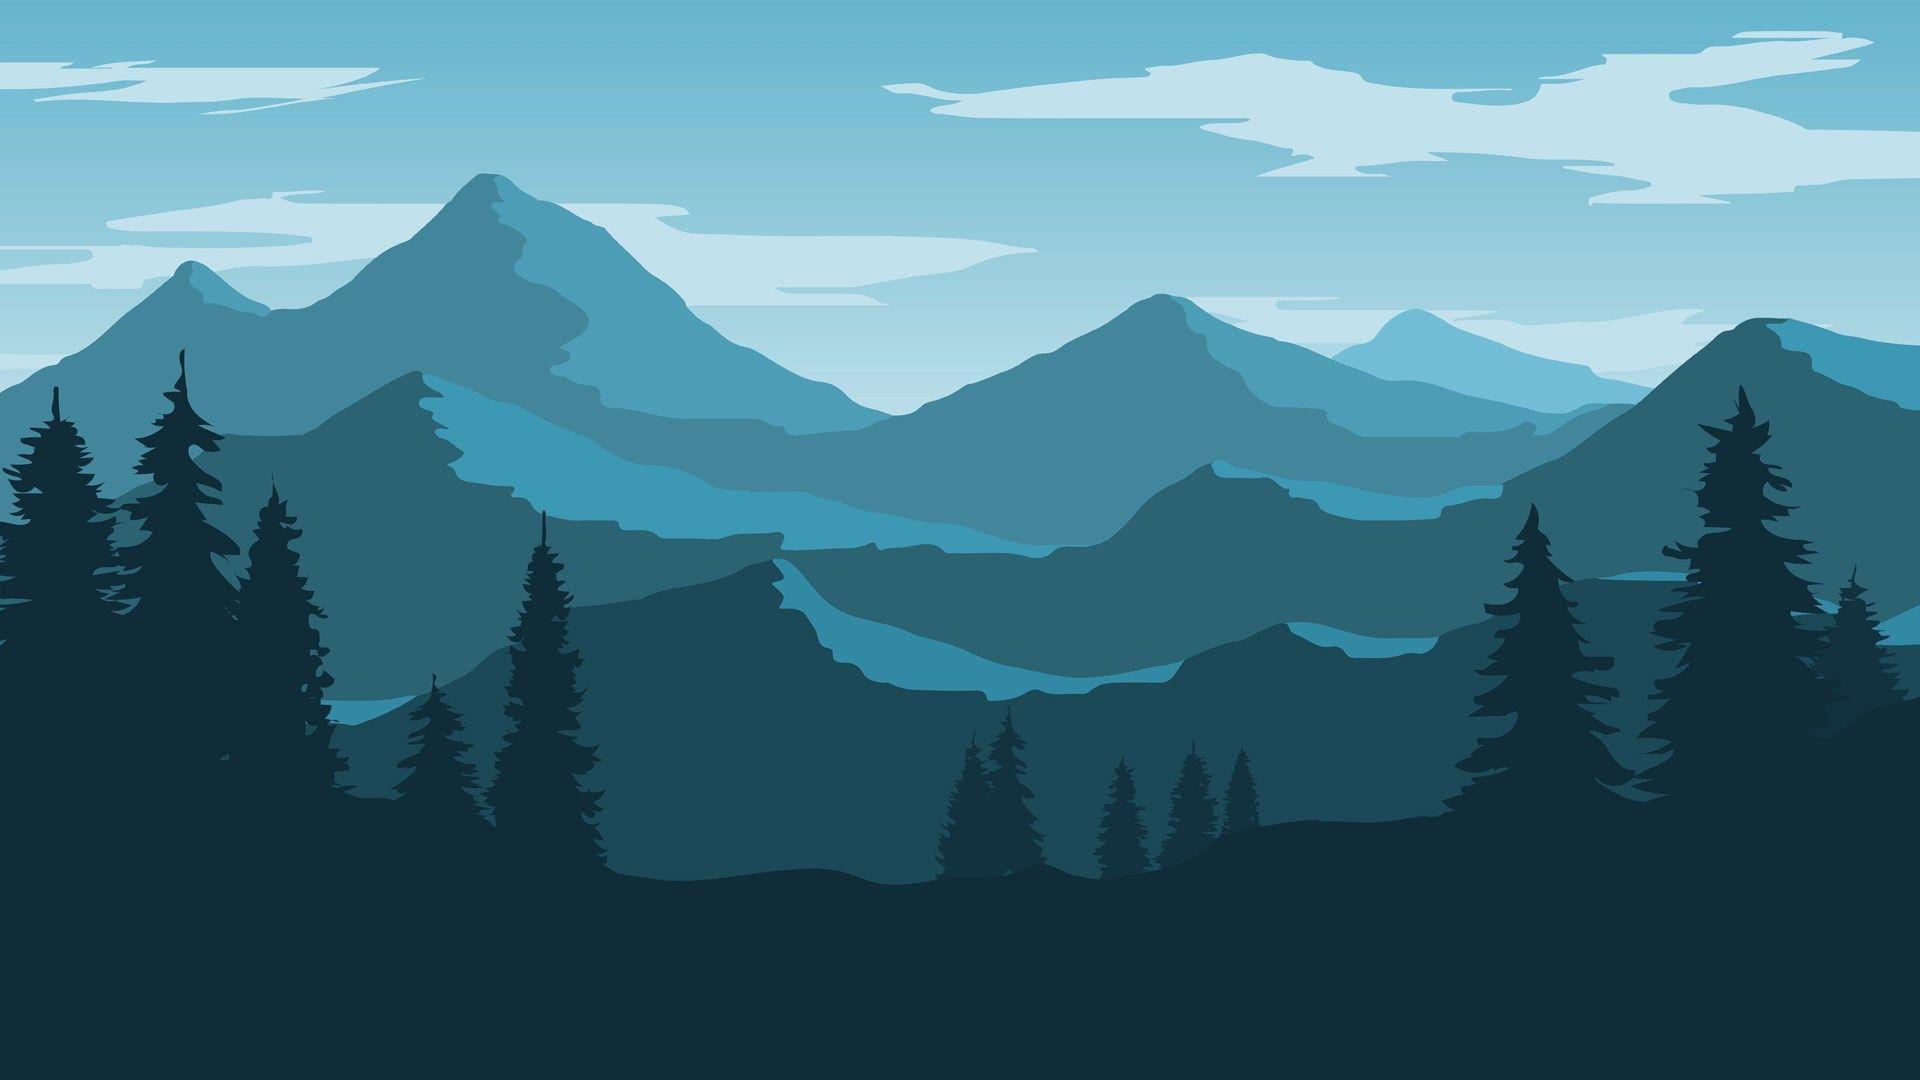 Vector Art Premium For Windows 10 In 2020 Vector Art Windows 10 Background Images